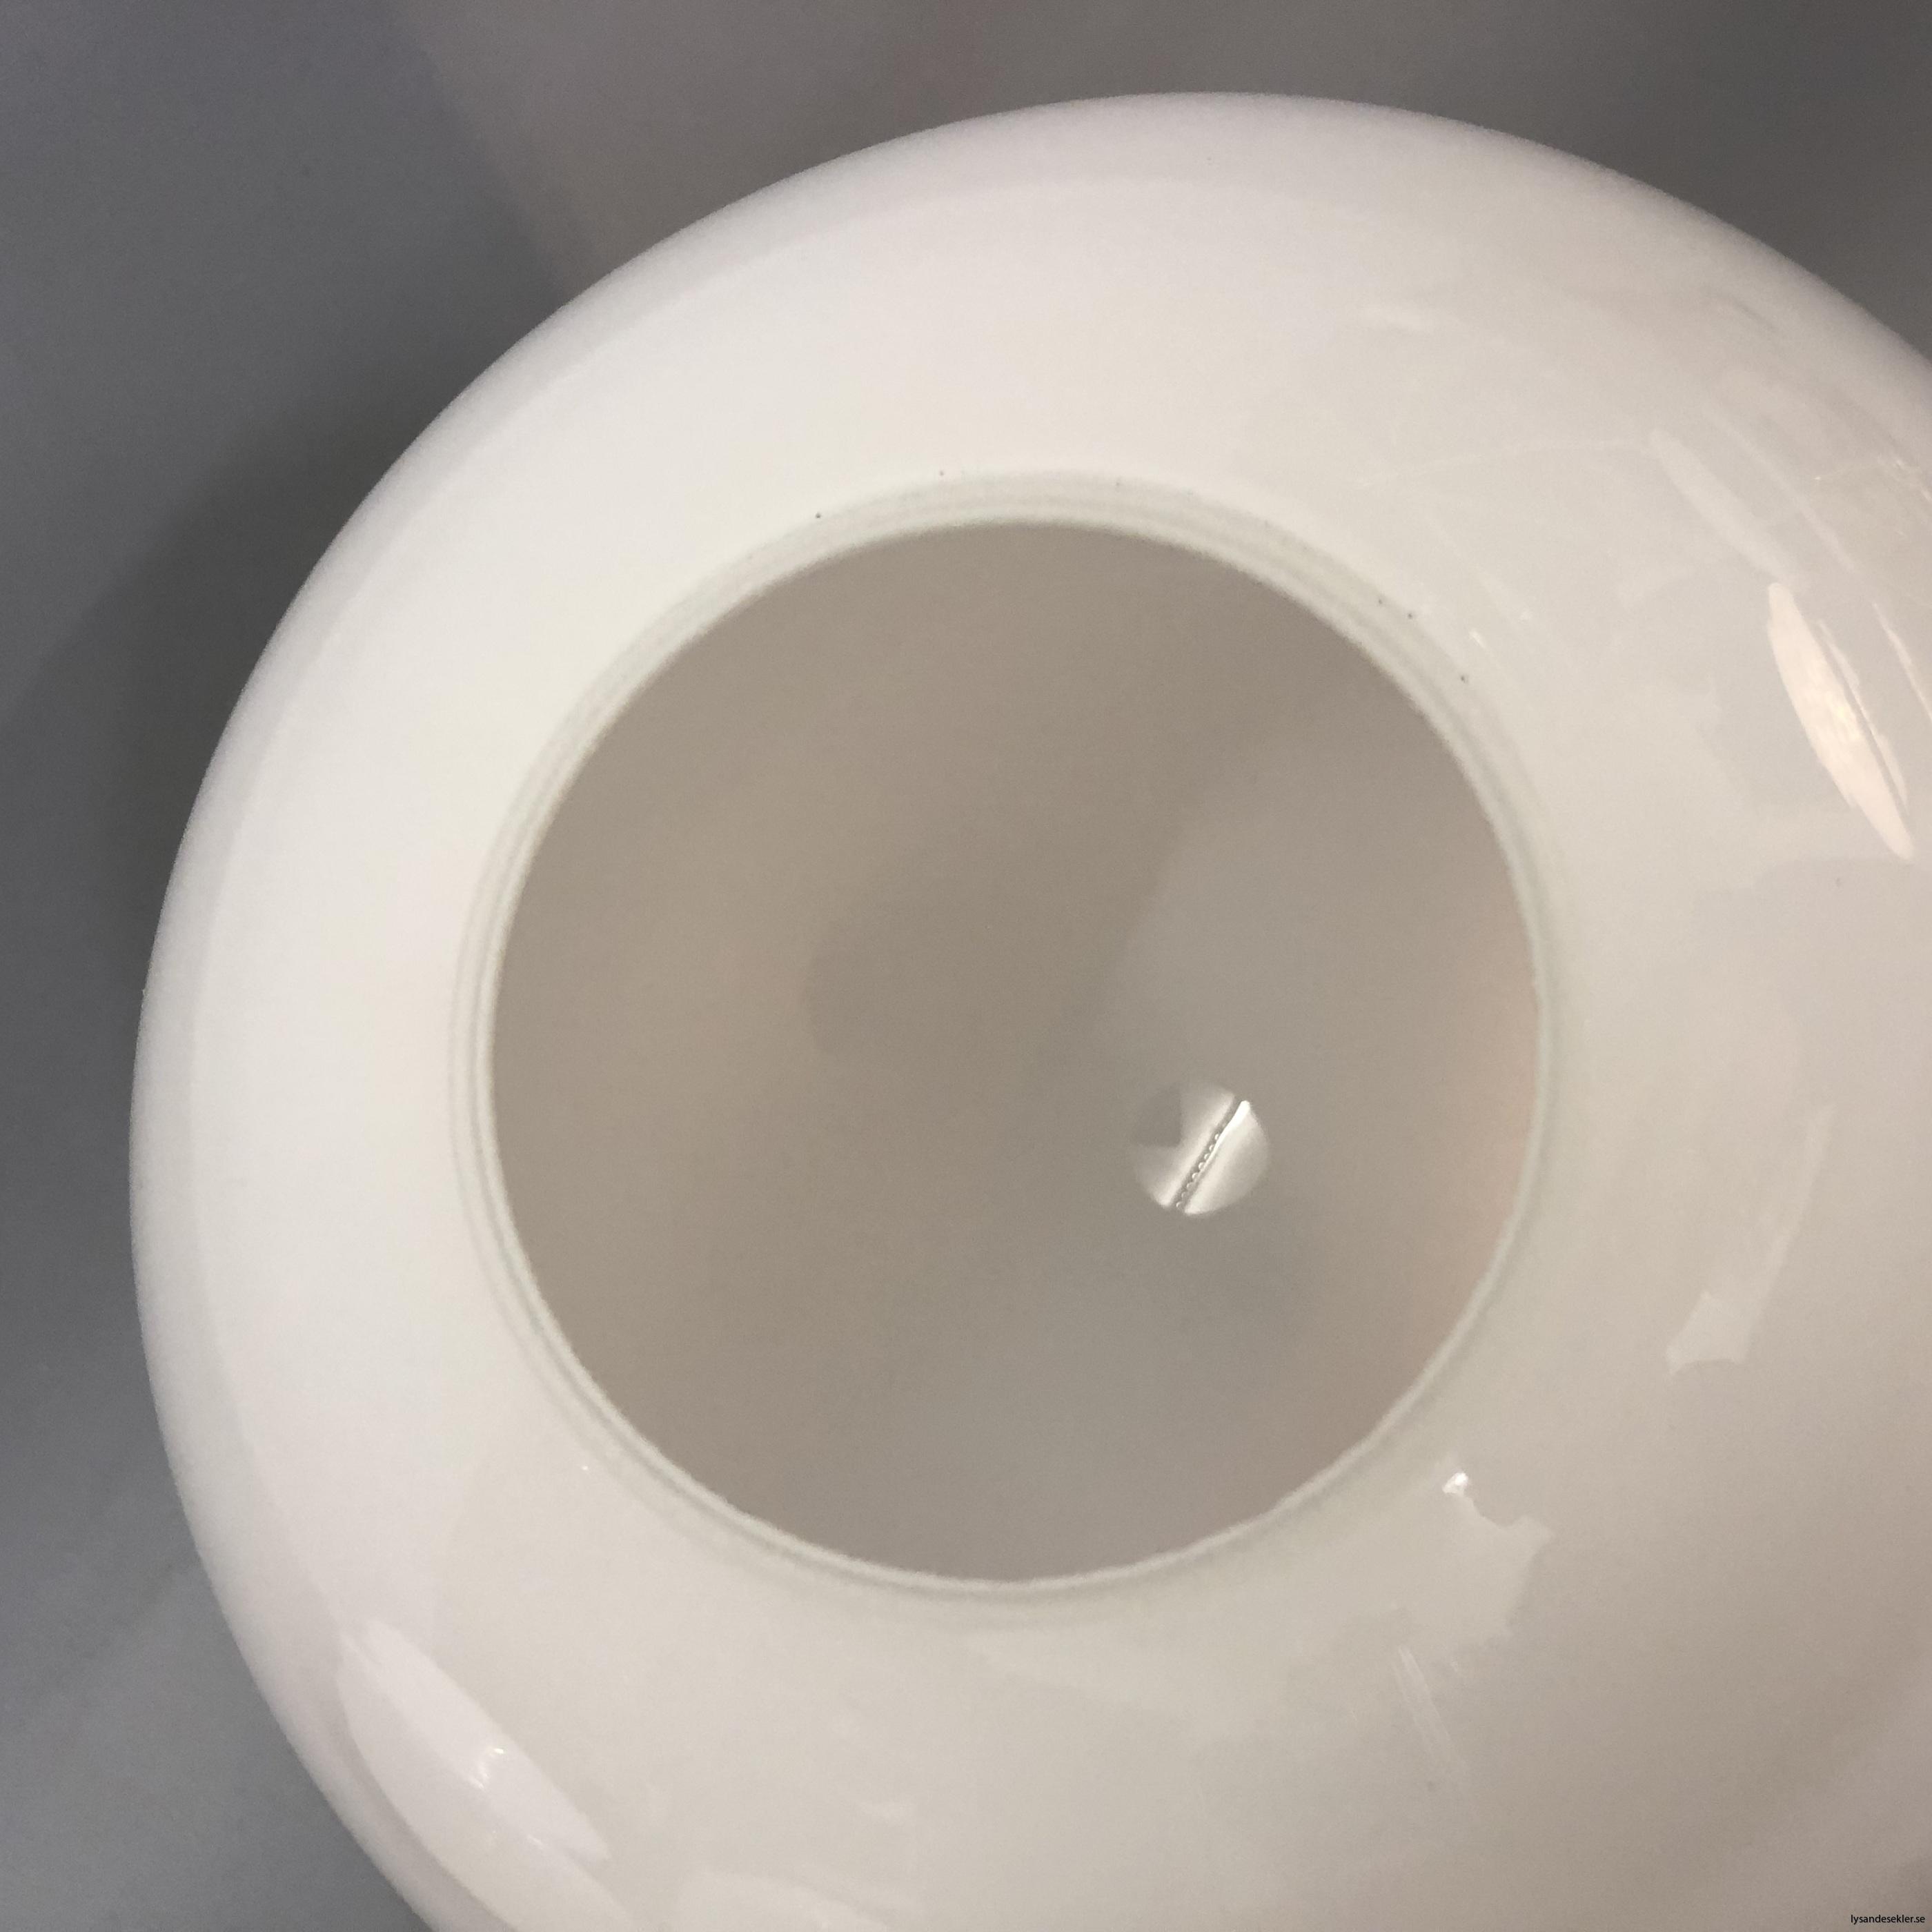 klotkupa klotkupor opalvit vit vita lampkupa klot klotform14